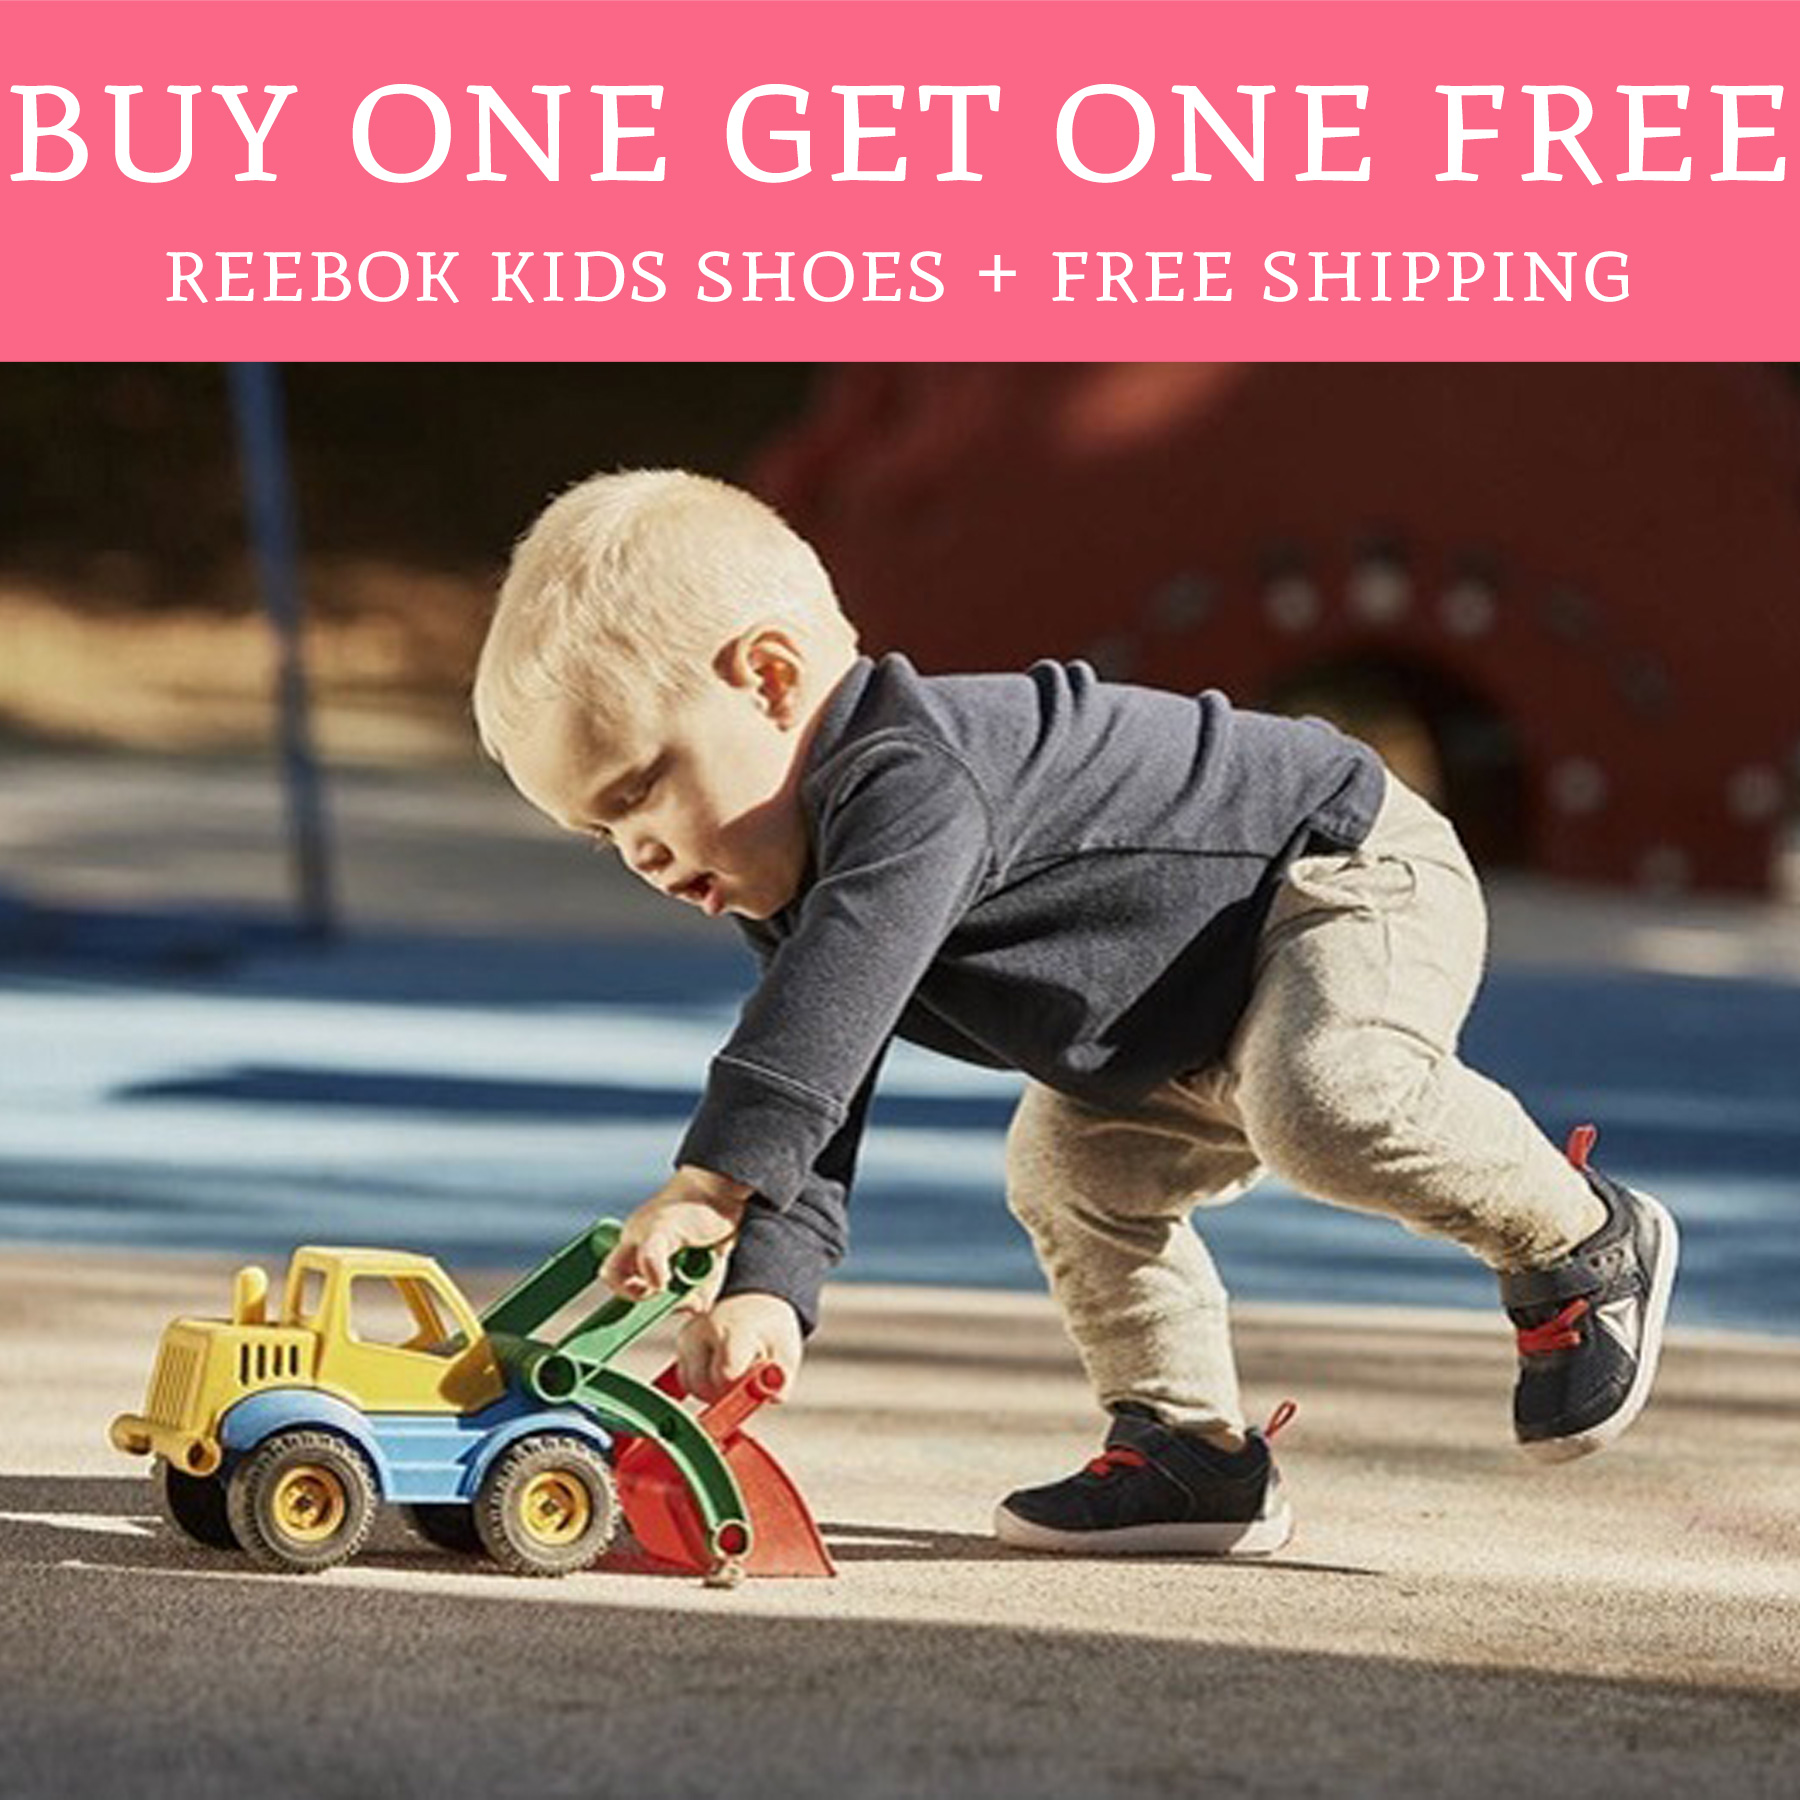 3dea318f45b Buy One Get One Free Reebok Kids Shoes + Free Shipping - Deal ...